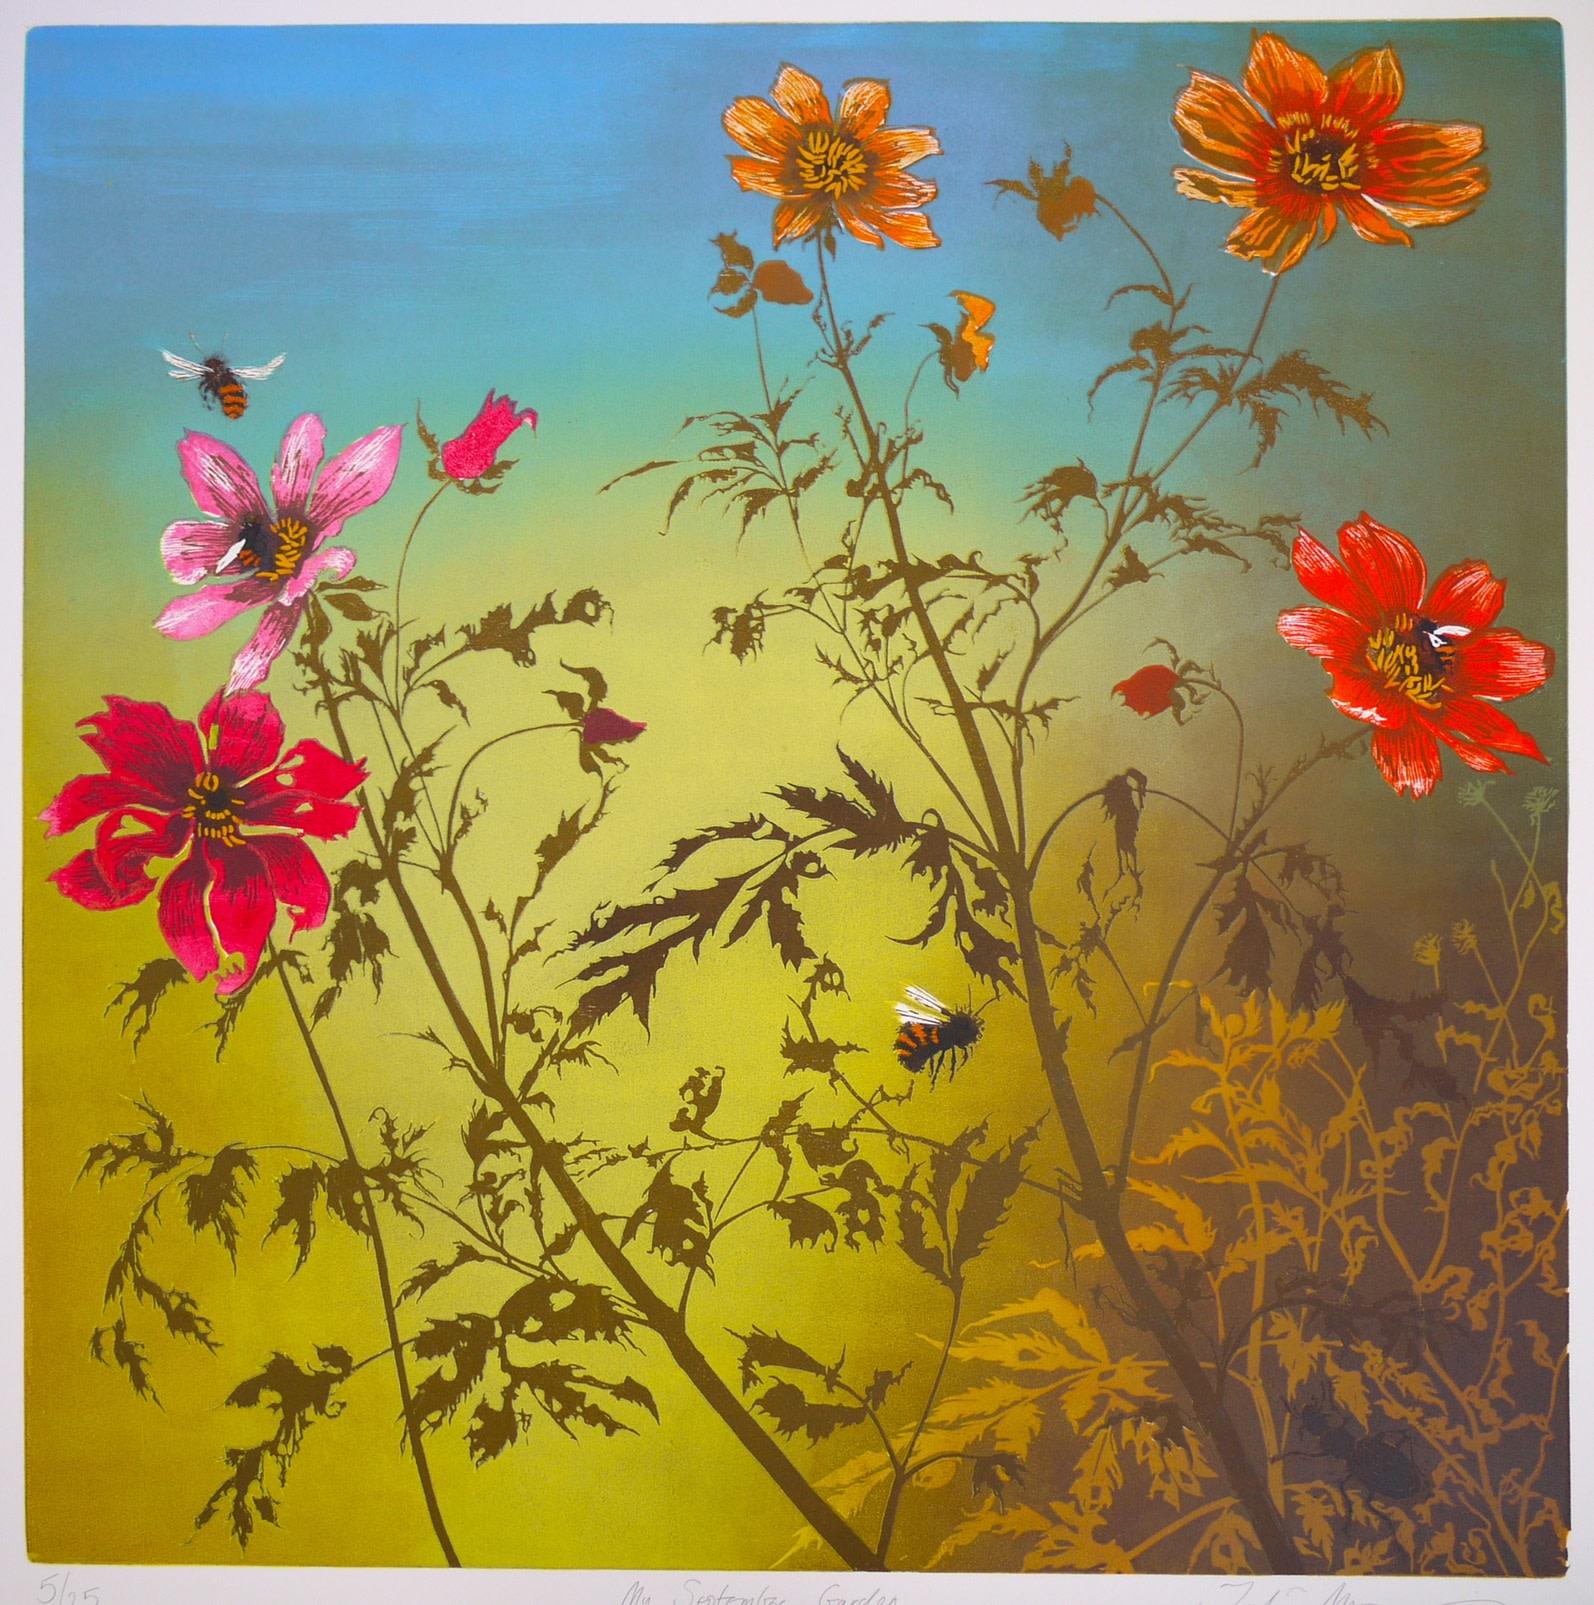 "<span class=""link fancybox-details-link""><a href=""/artists/96-julia-manning-re/works/9580/"">View Detail Page</a></span><div class=""artist""><span class=""artist""><strong>Julia Manning RE</strong></span></div><div class=""title""><em>My September Garden</em></div><div class=""price"">£950.00</div>"